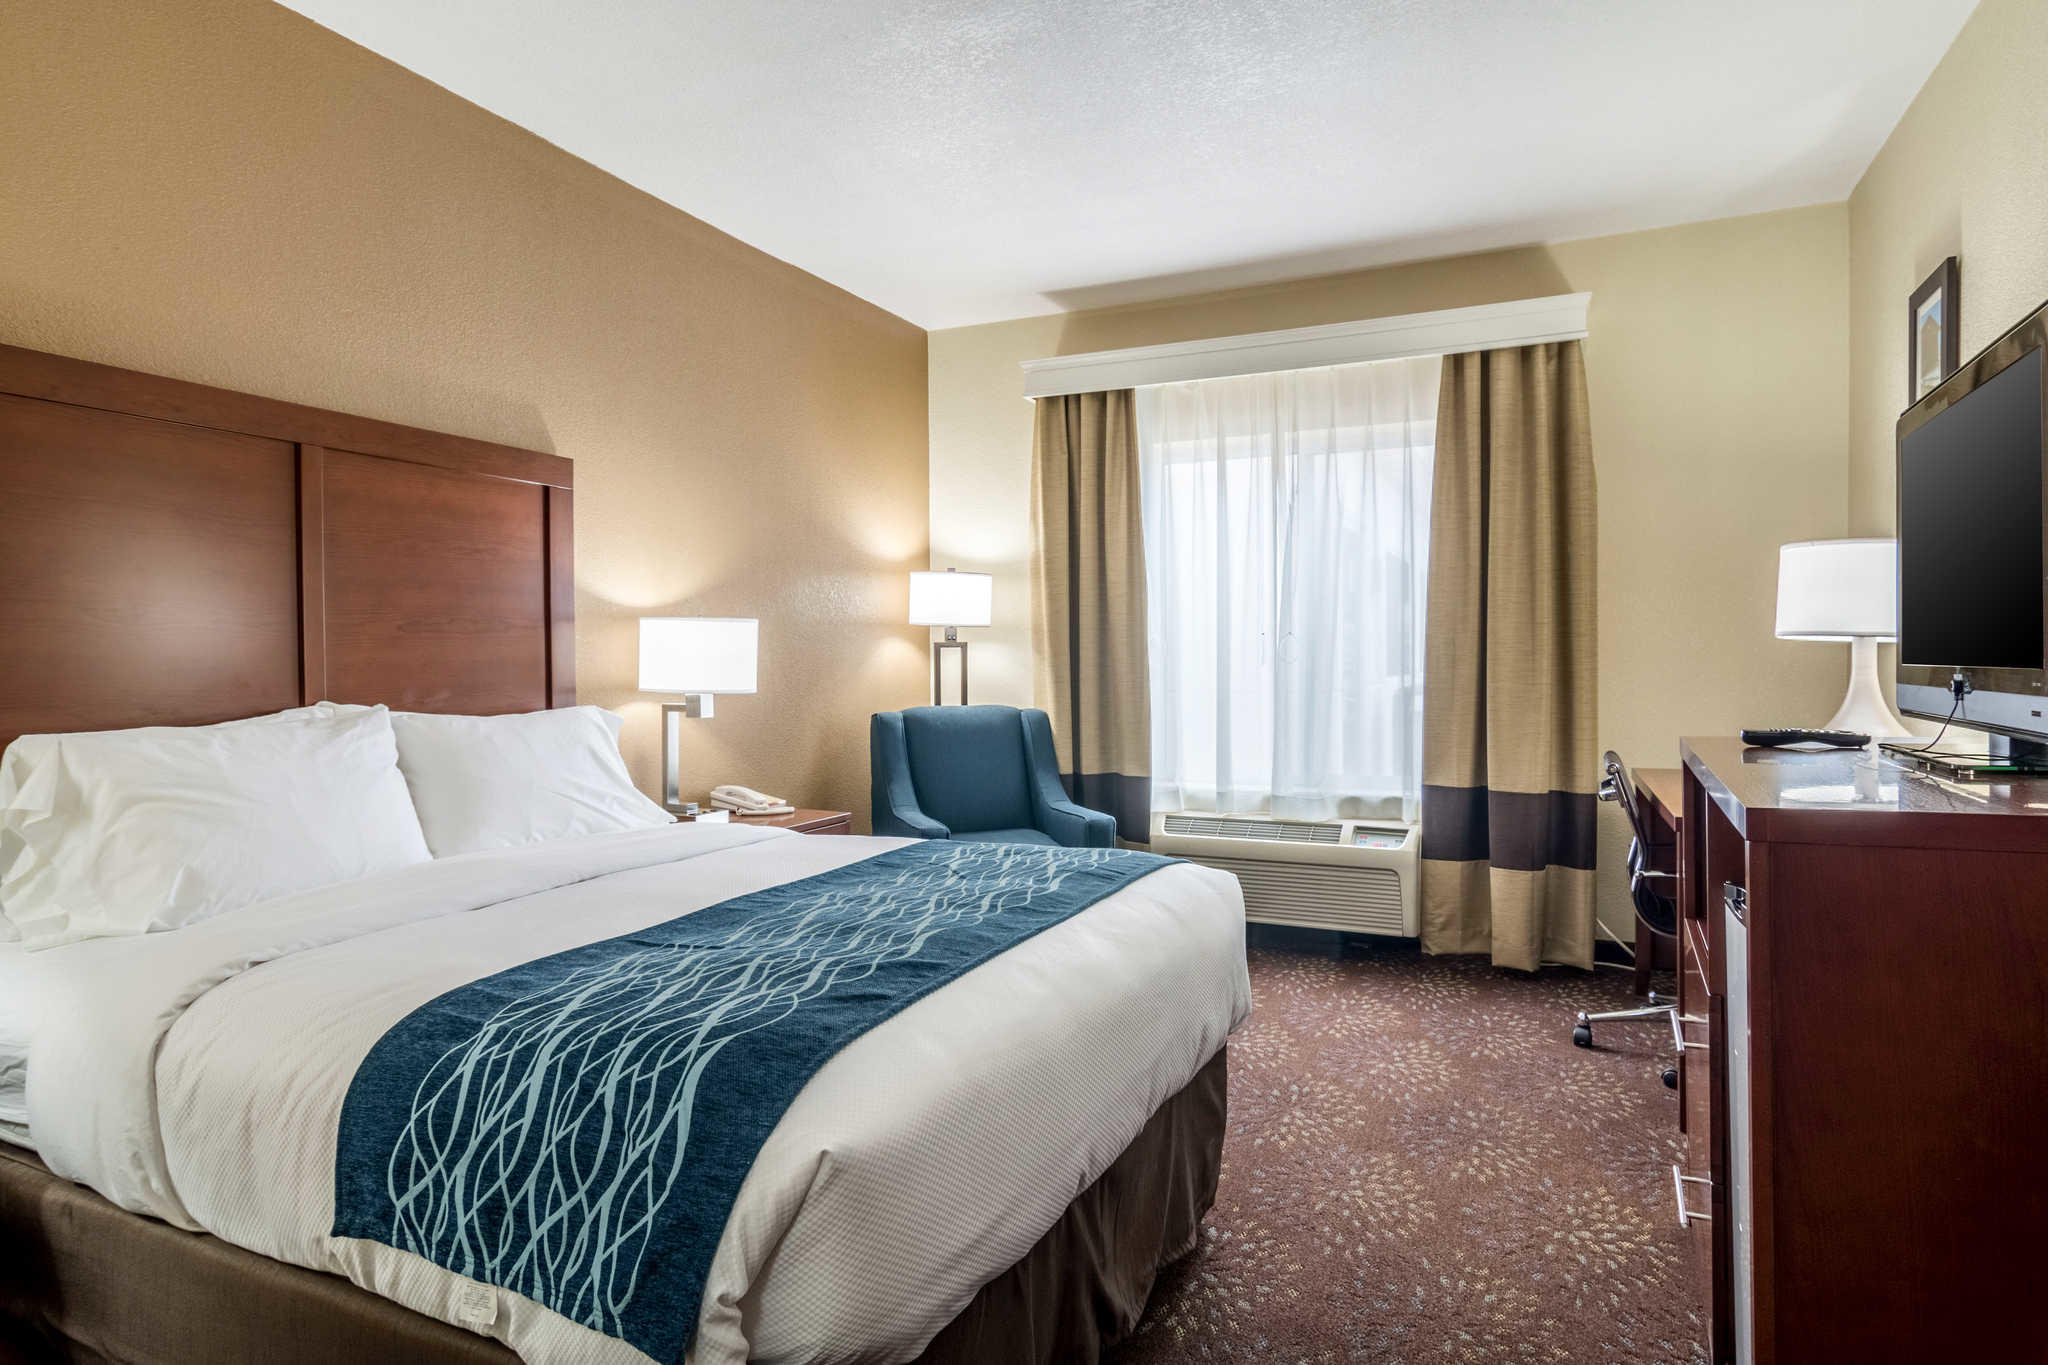 Comfort Inn Amp Suites Hannibal Missouri Mo